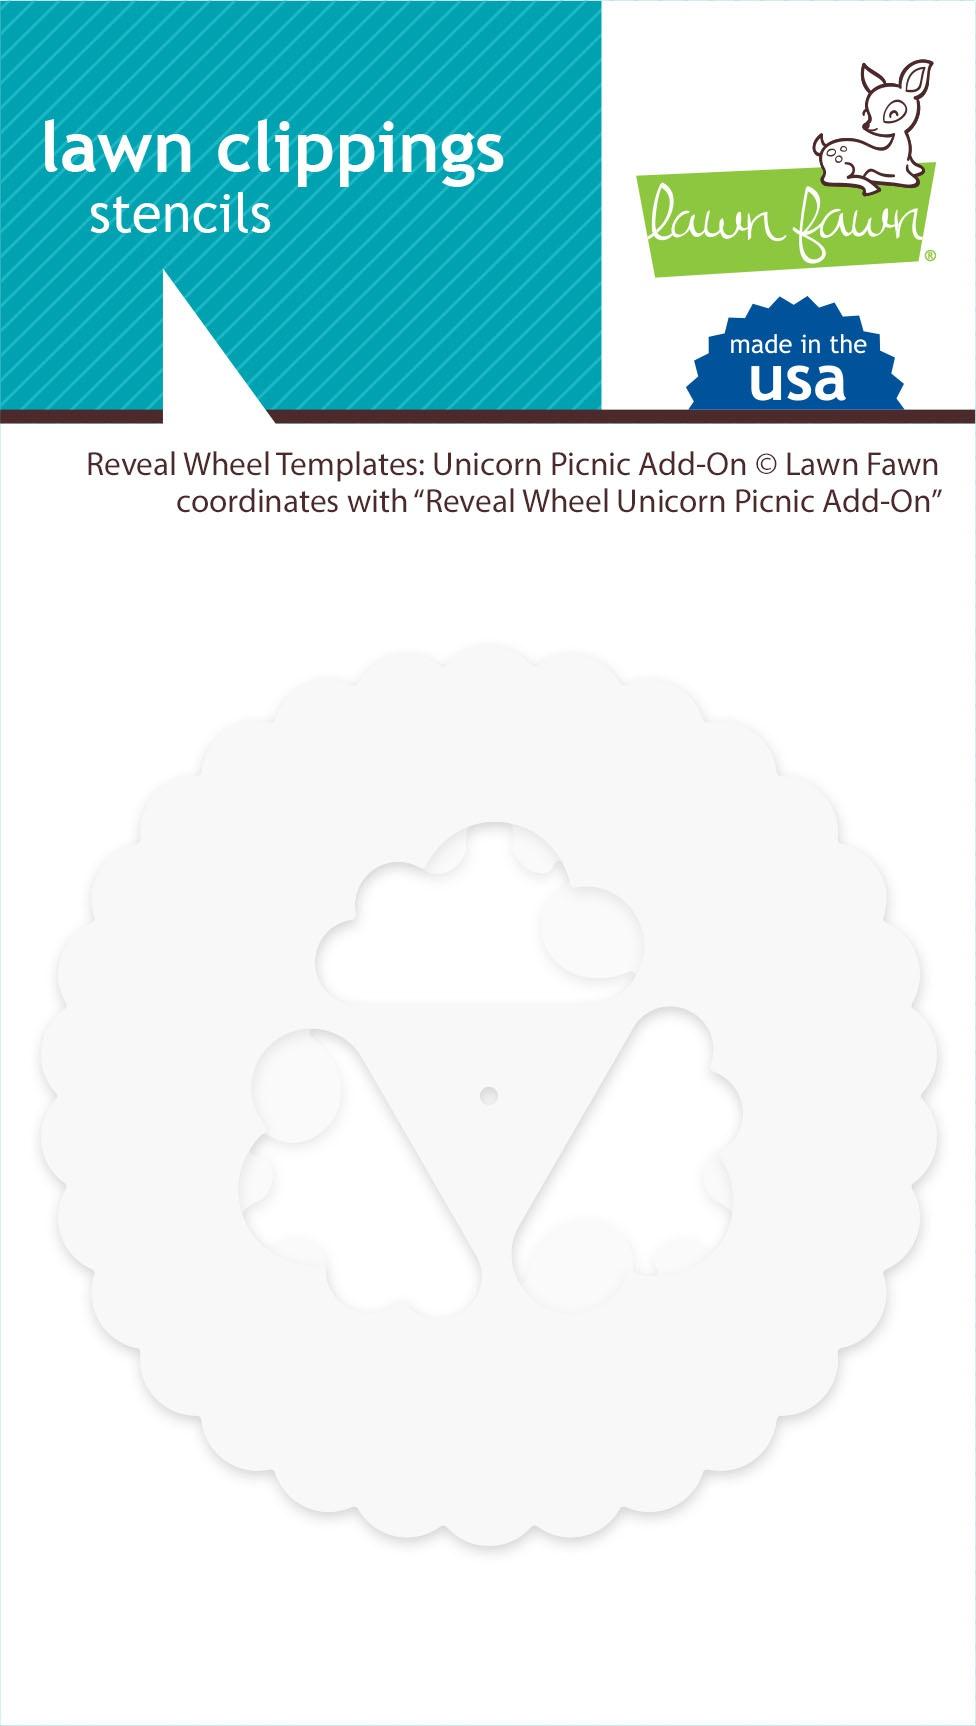 RW Templates - Unicorn Picnic